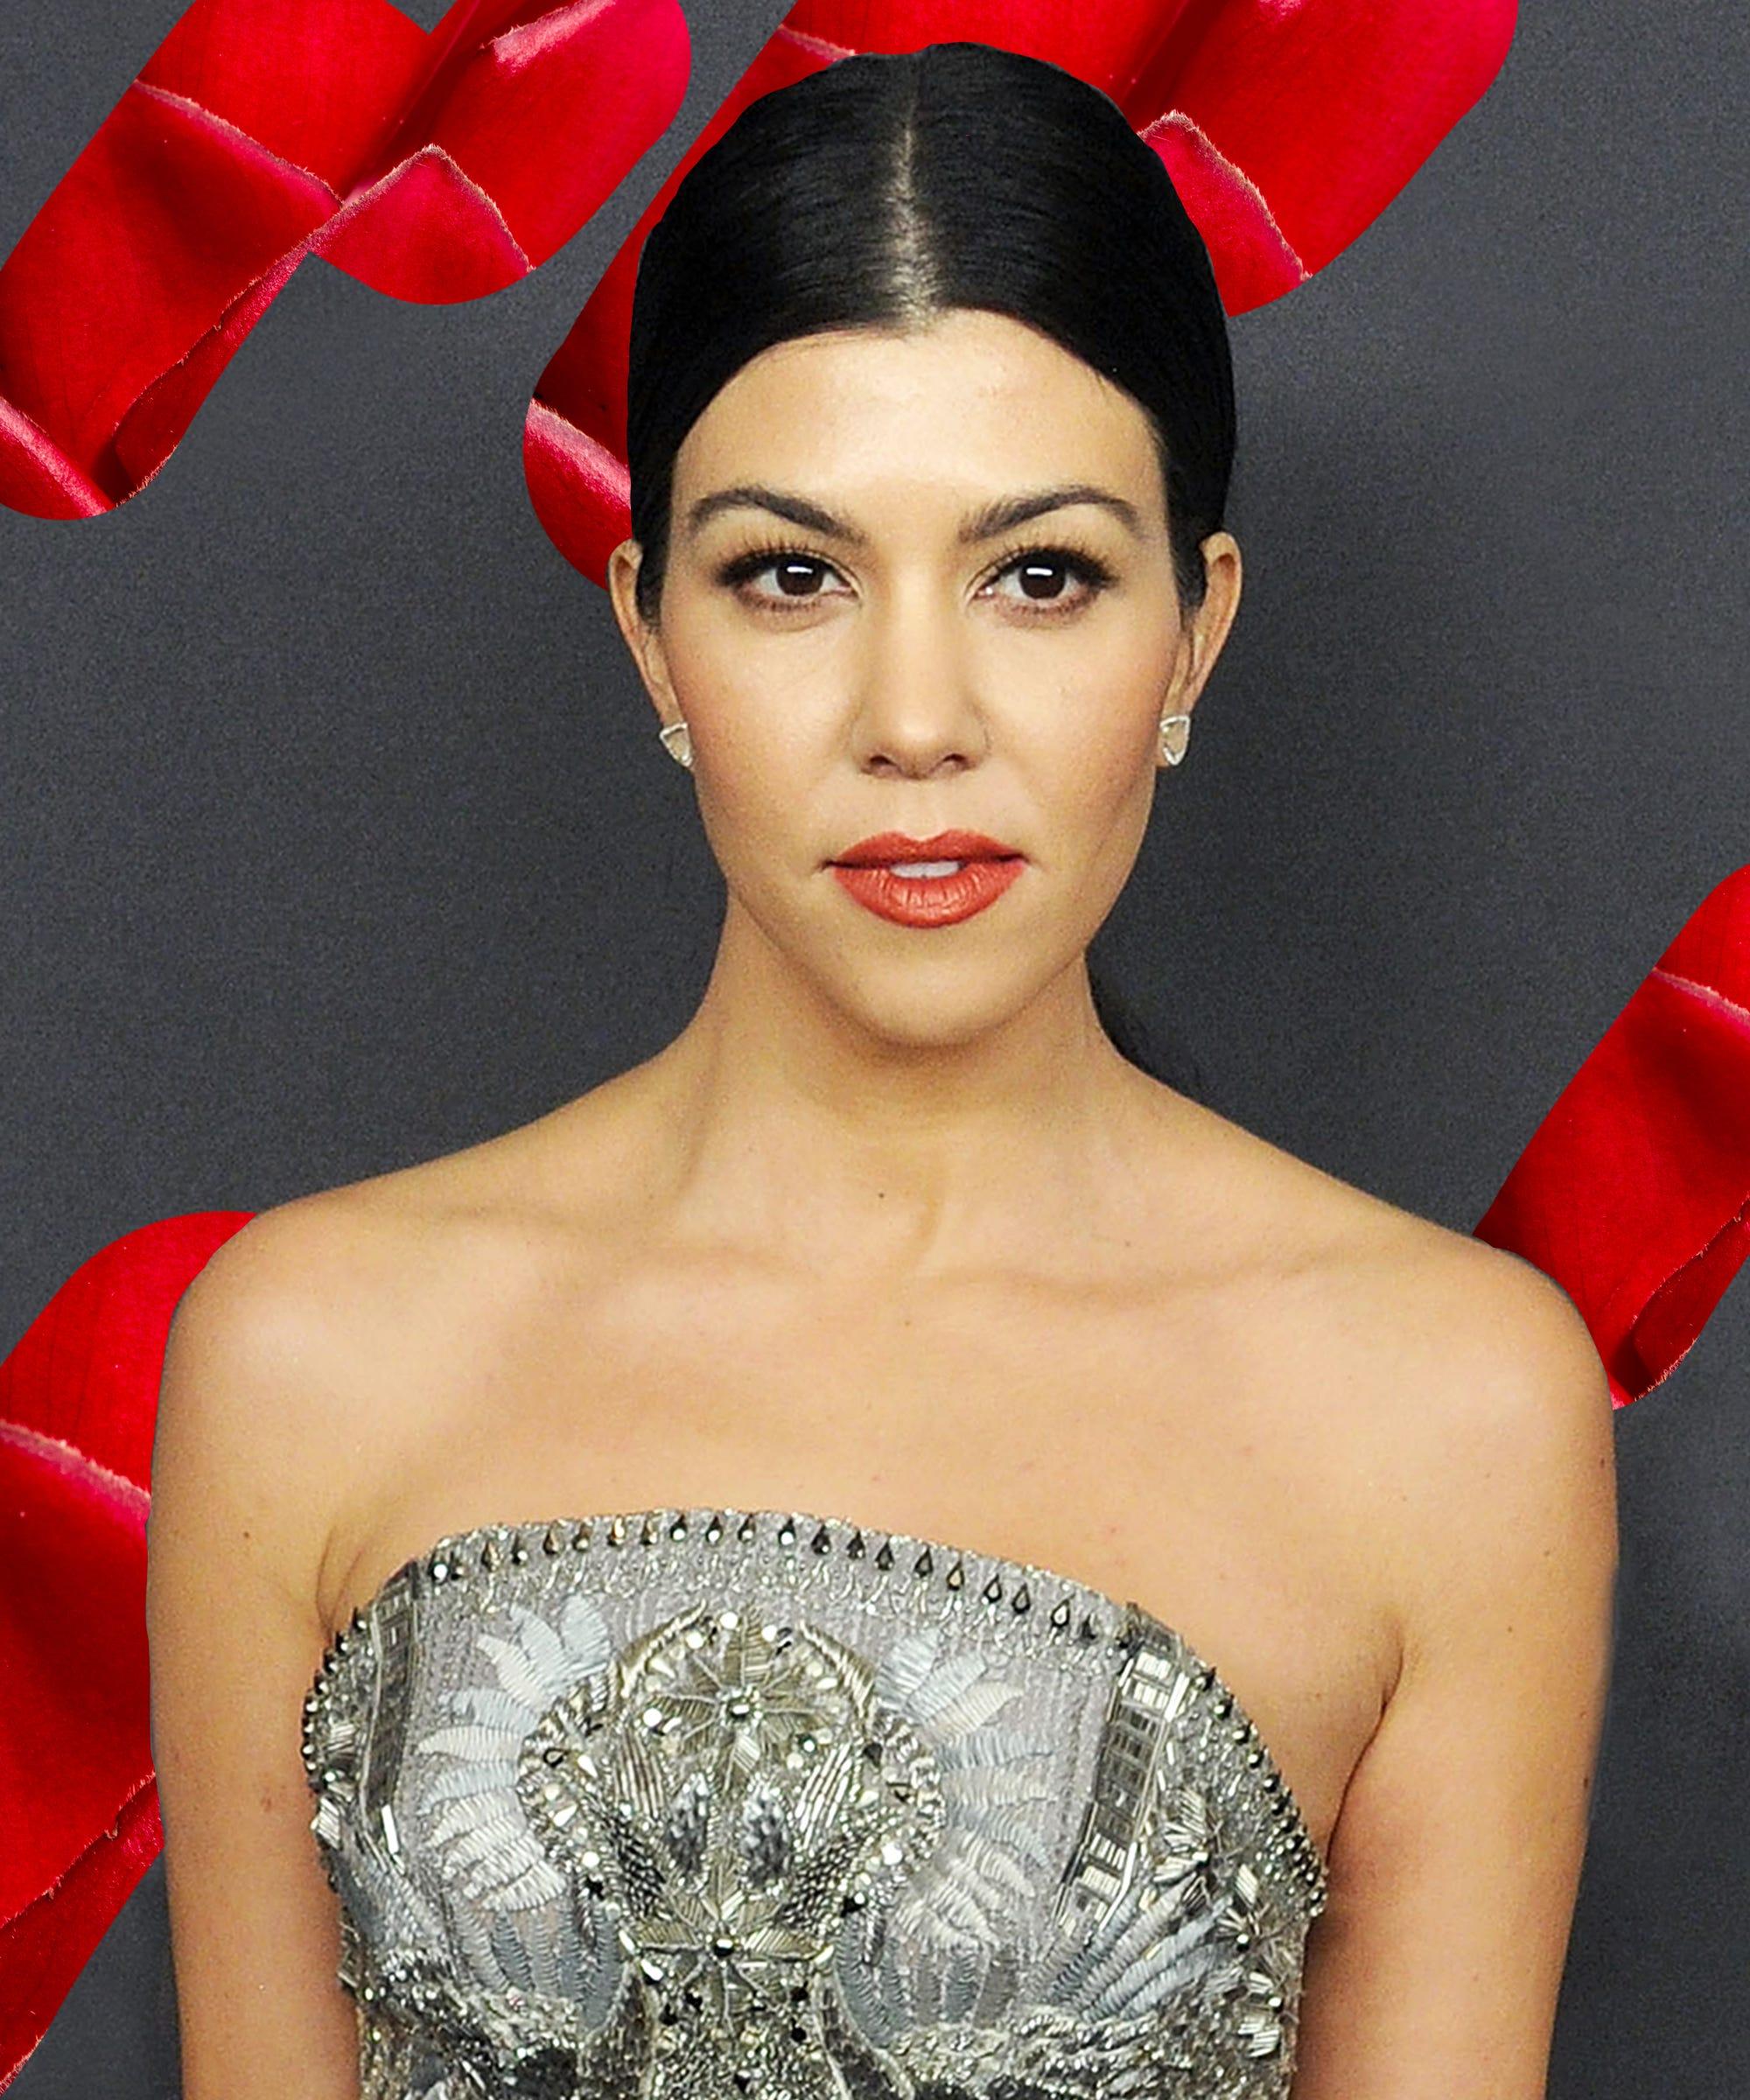 Images Kourtney Mary Kardashian nudes (63 photos), Sexy, Leaked, Feet, bra 2020